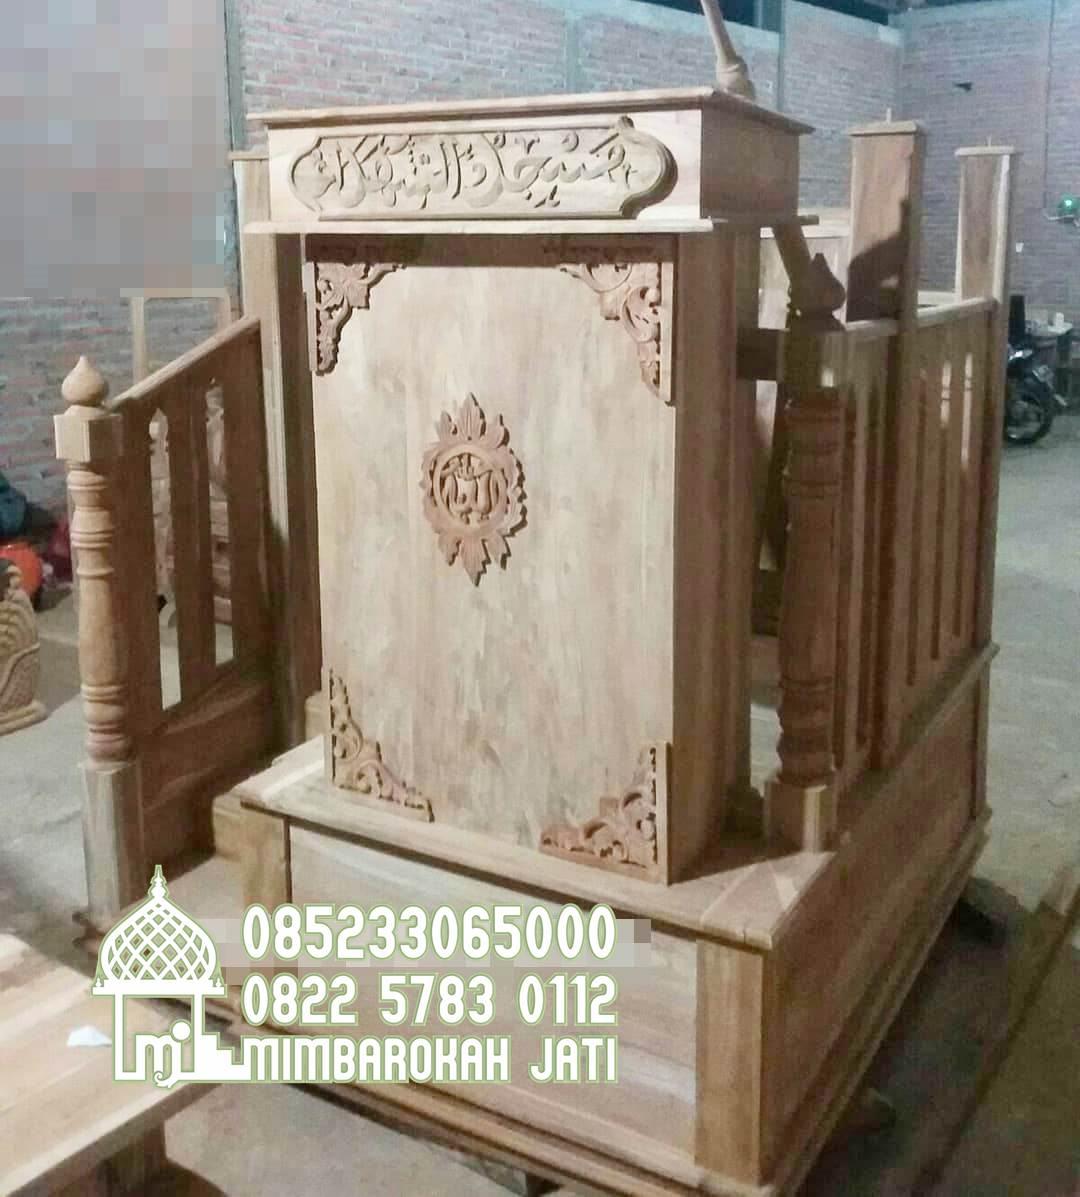 Mimbar Jati Minimalis Masjid Di Sukabumi